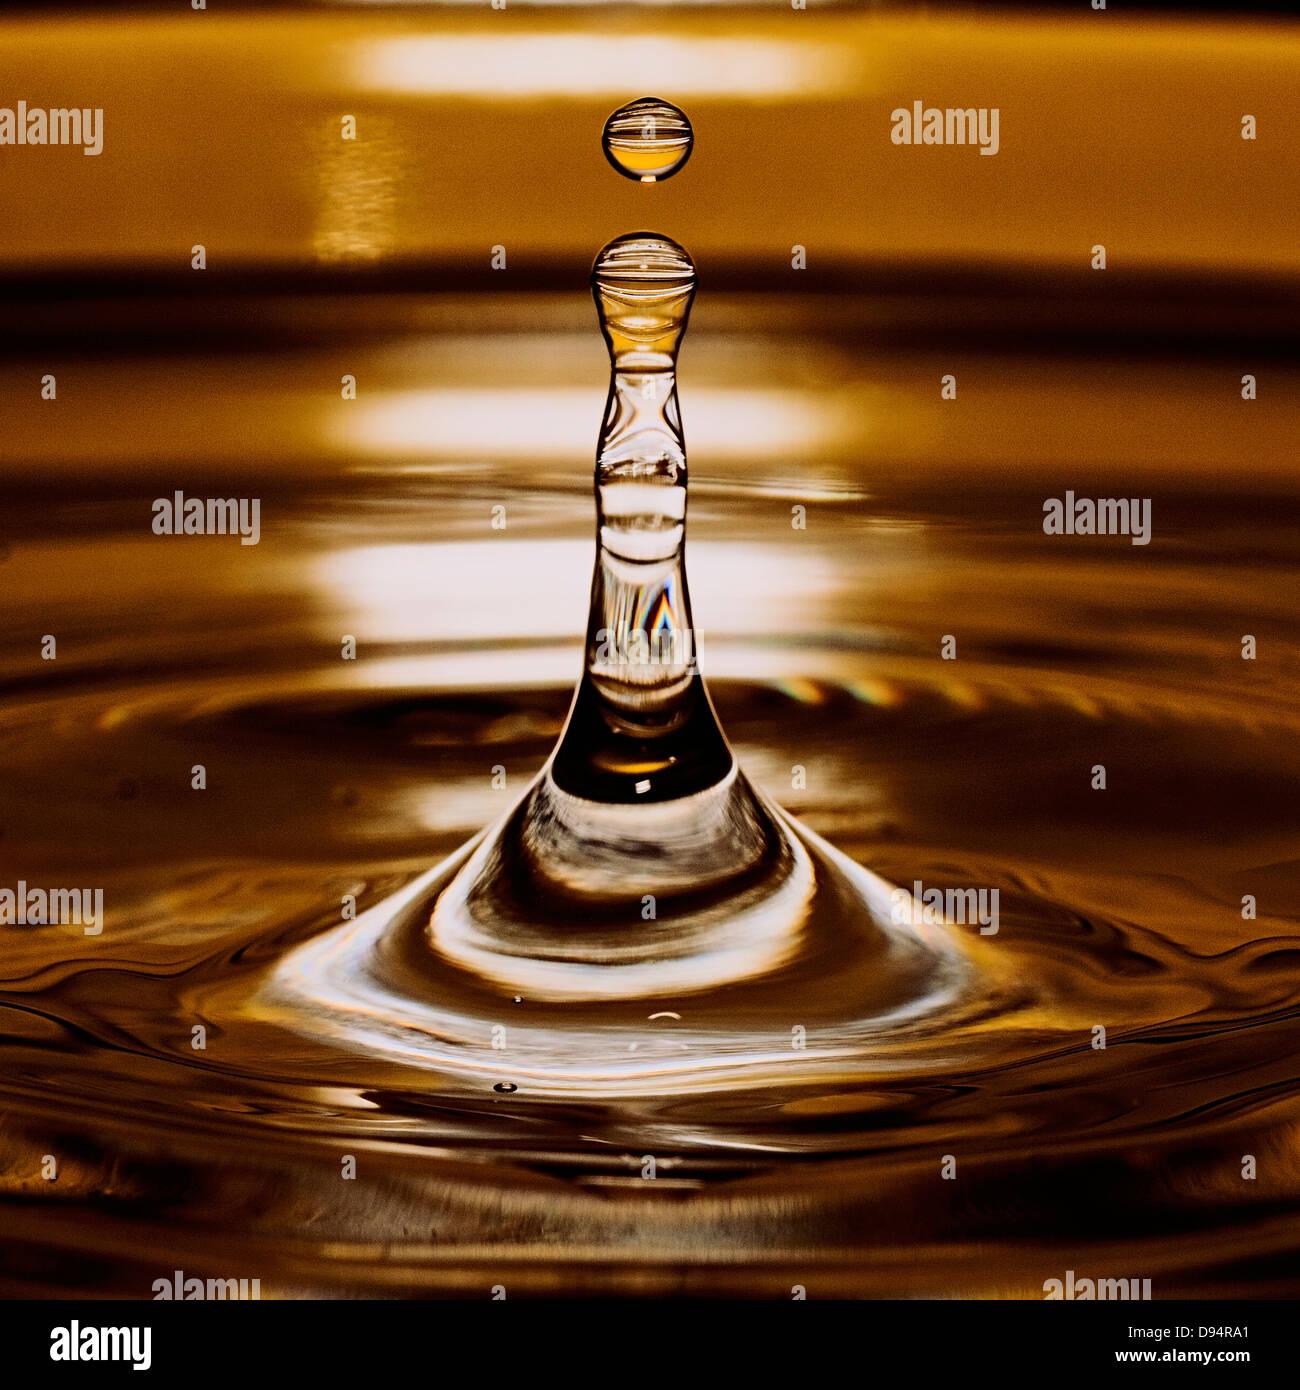 waterdrop - Stock Image